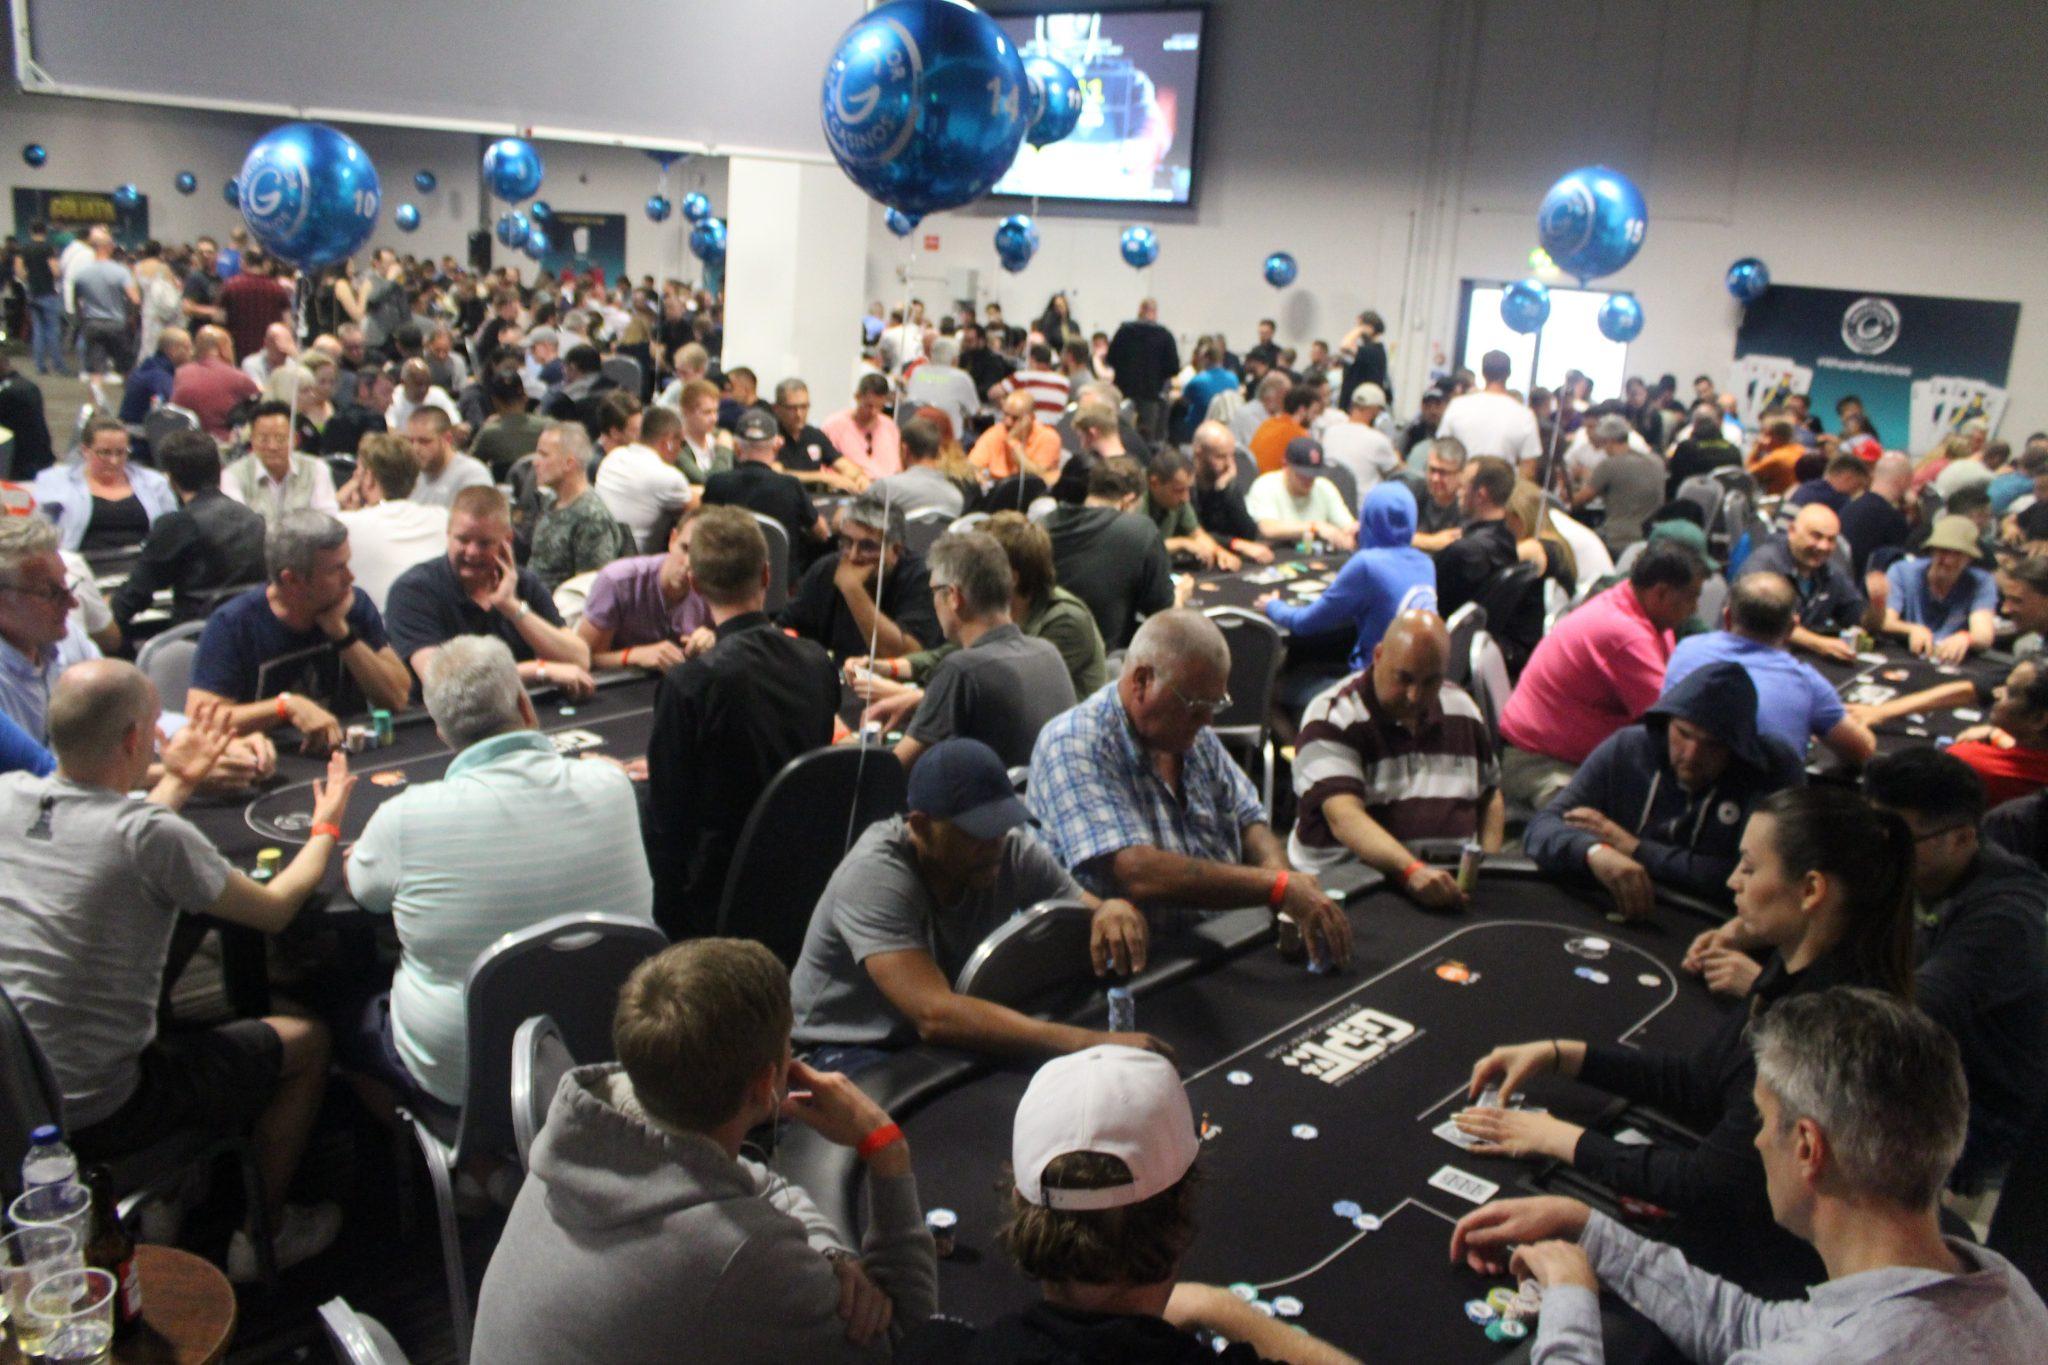 Bournemouth casino poker schedule free 2 player fighting games